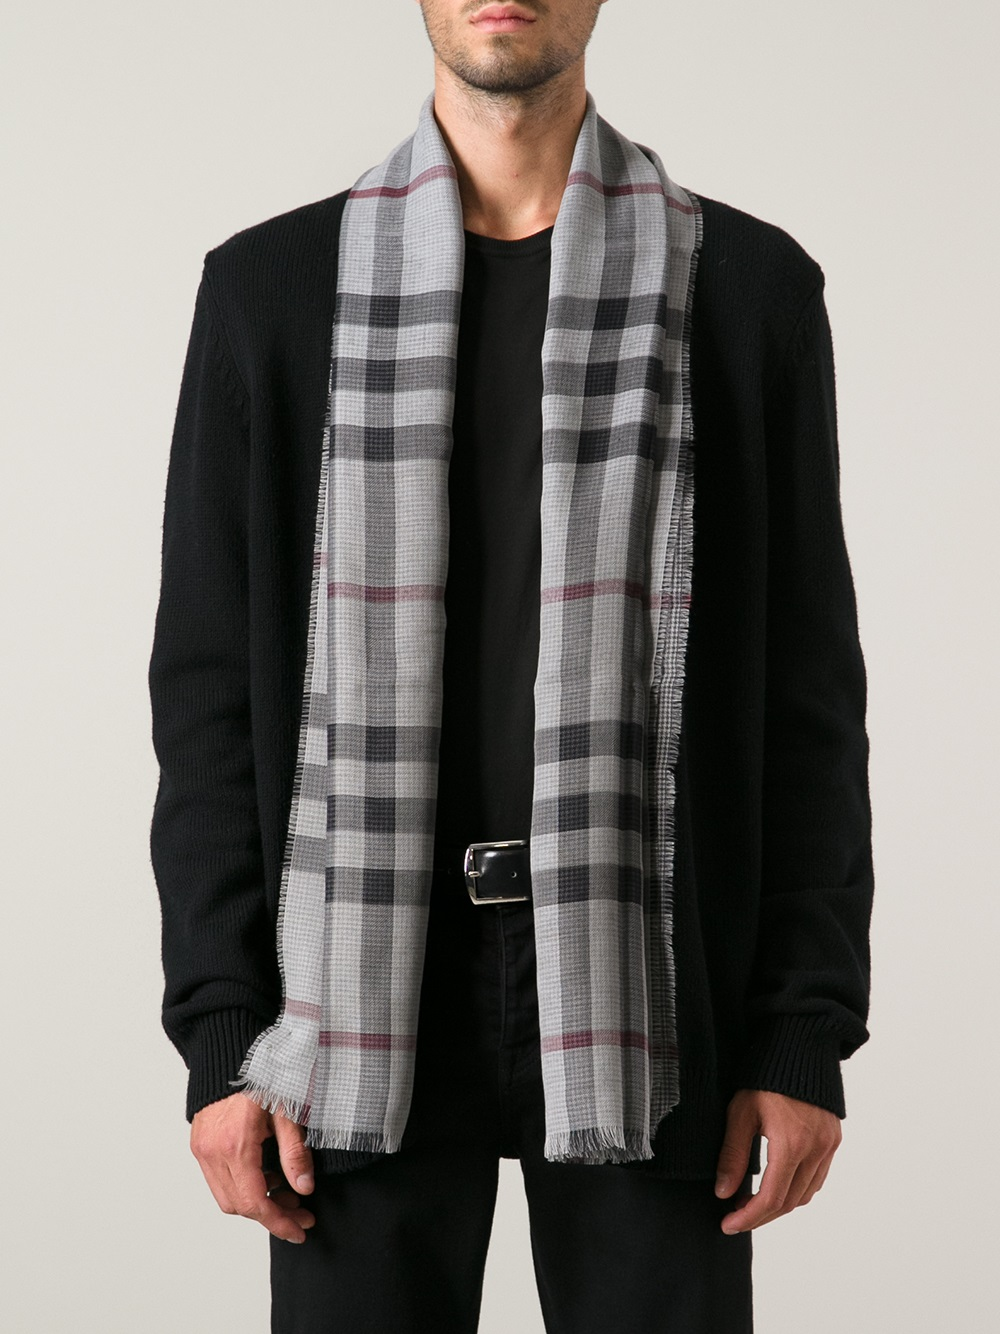 burberry scarves for mens wallets sale